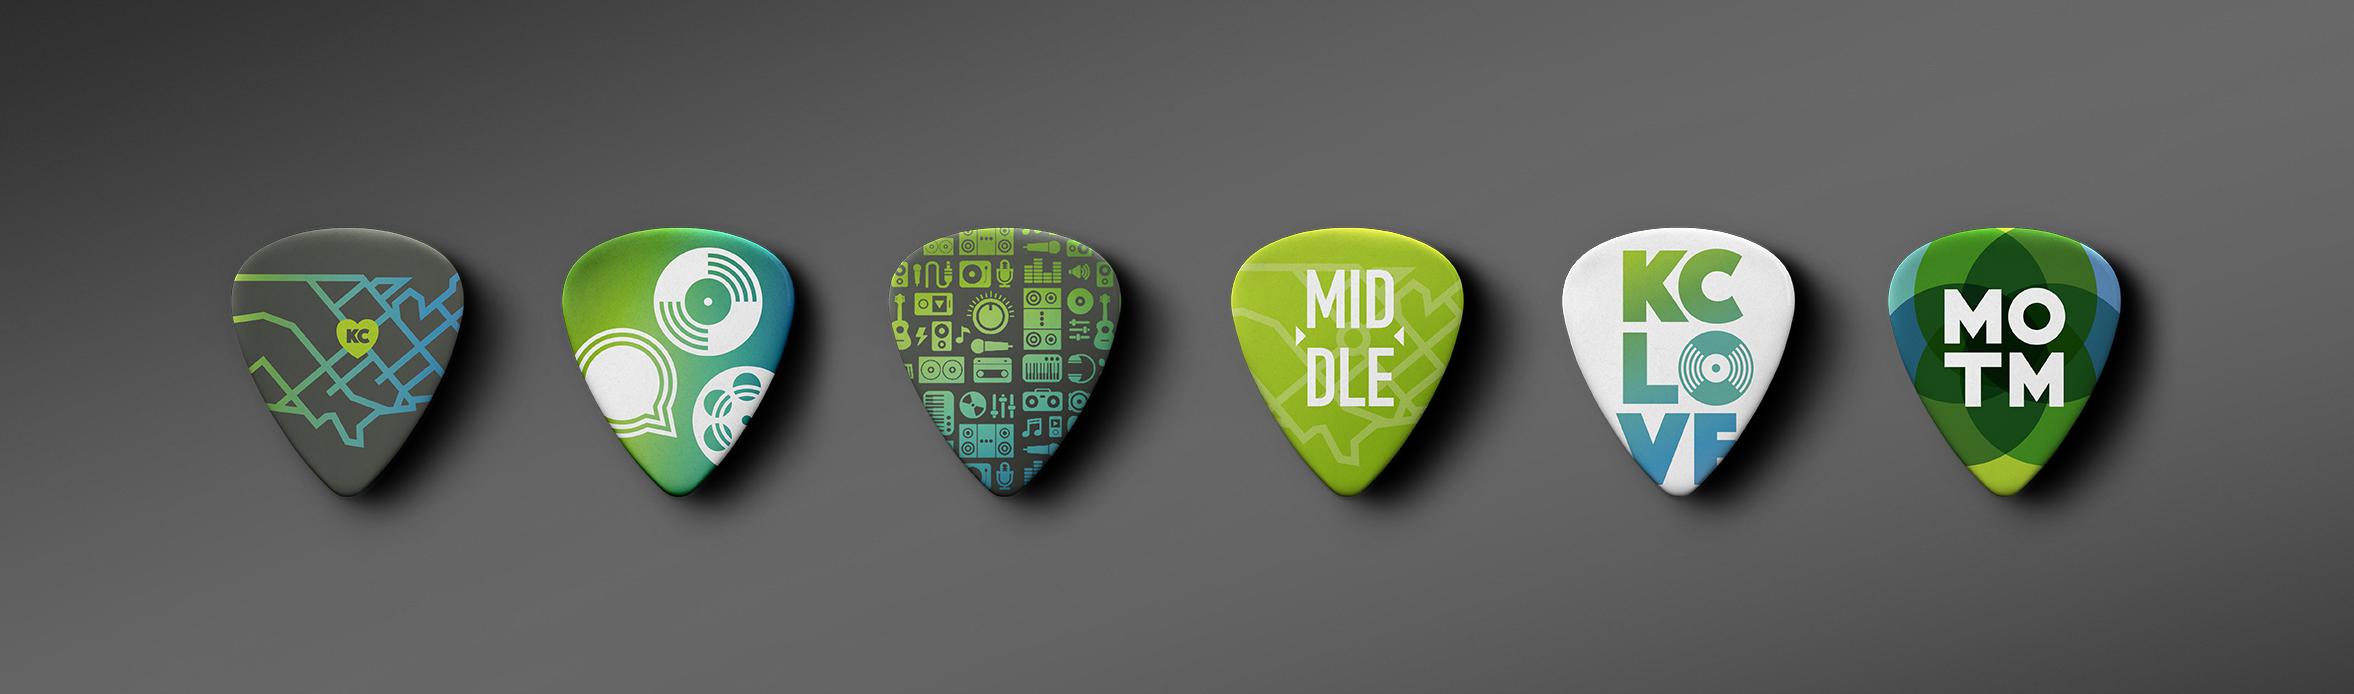 MOTM_Guitar_Picks